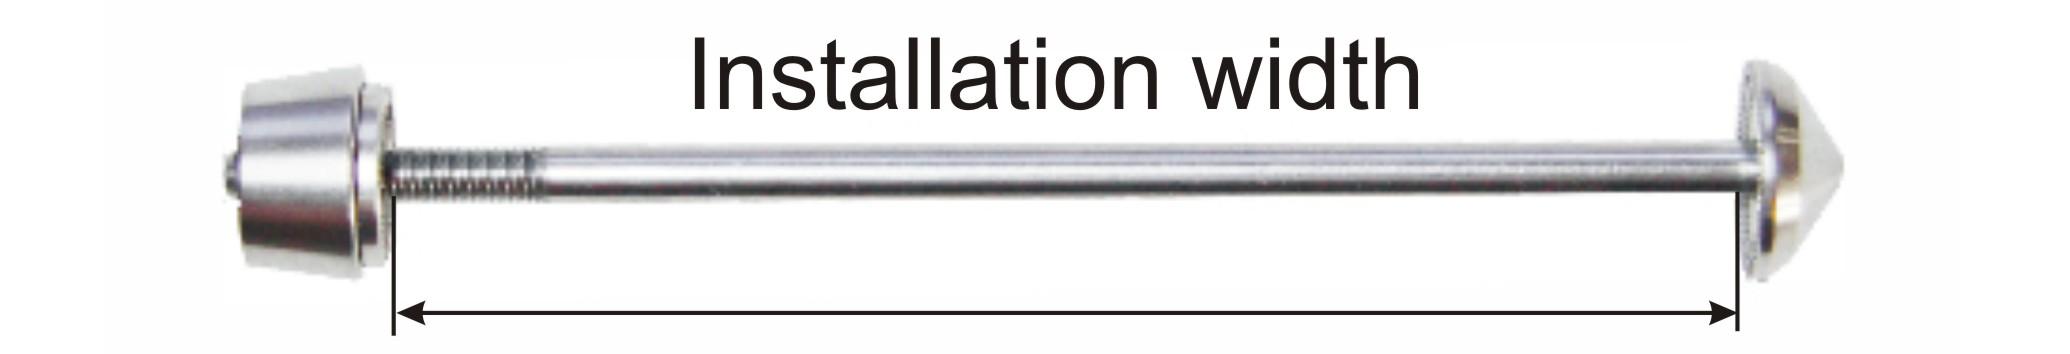 installation width